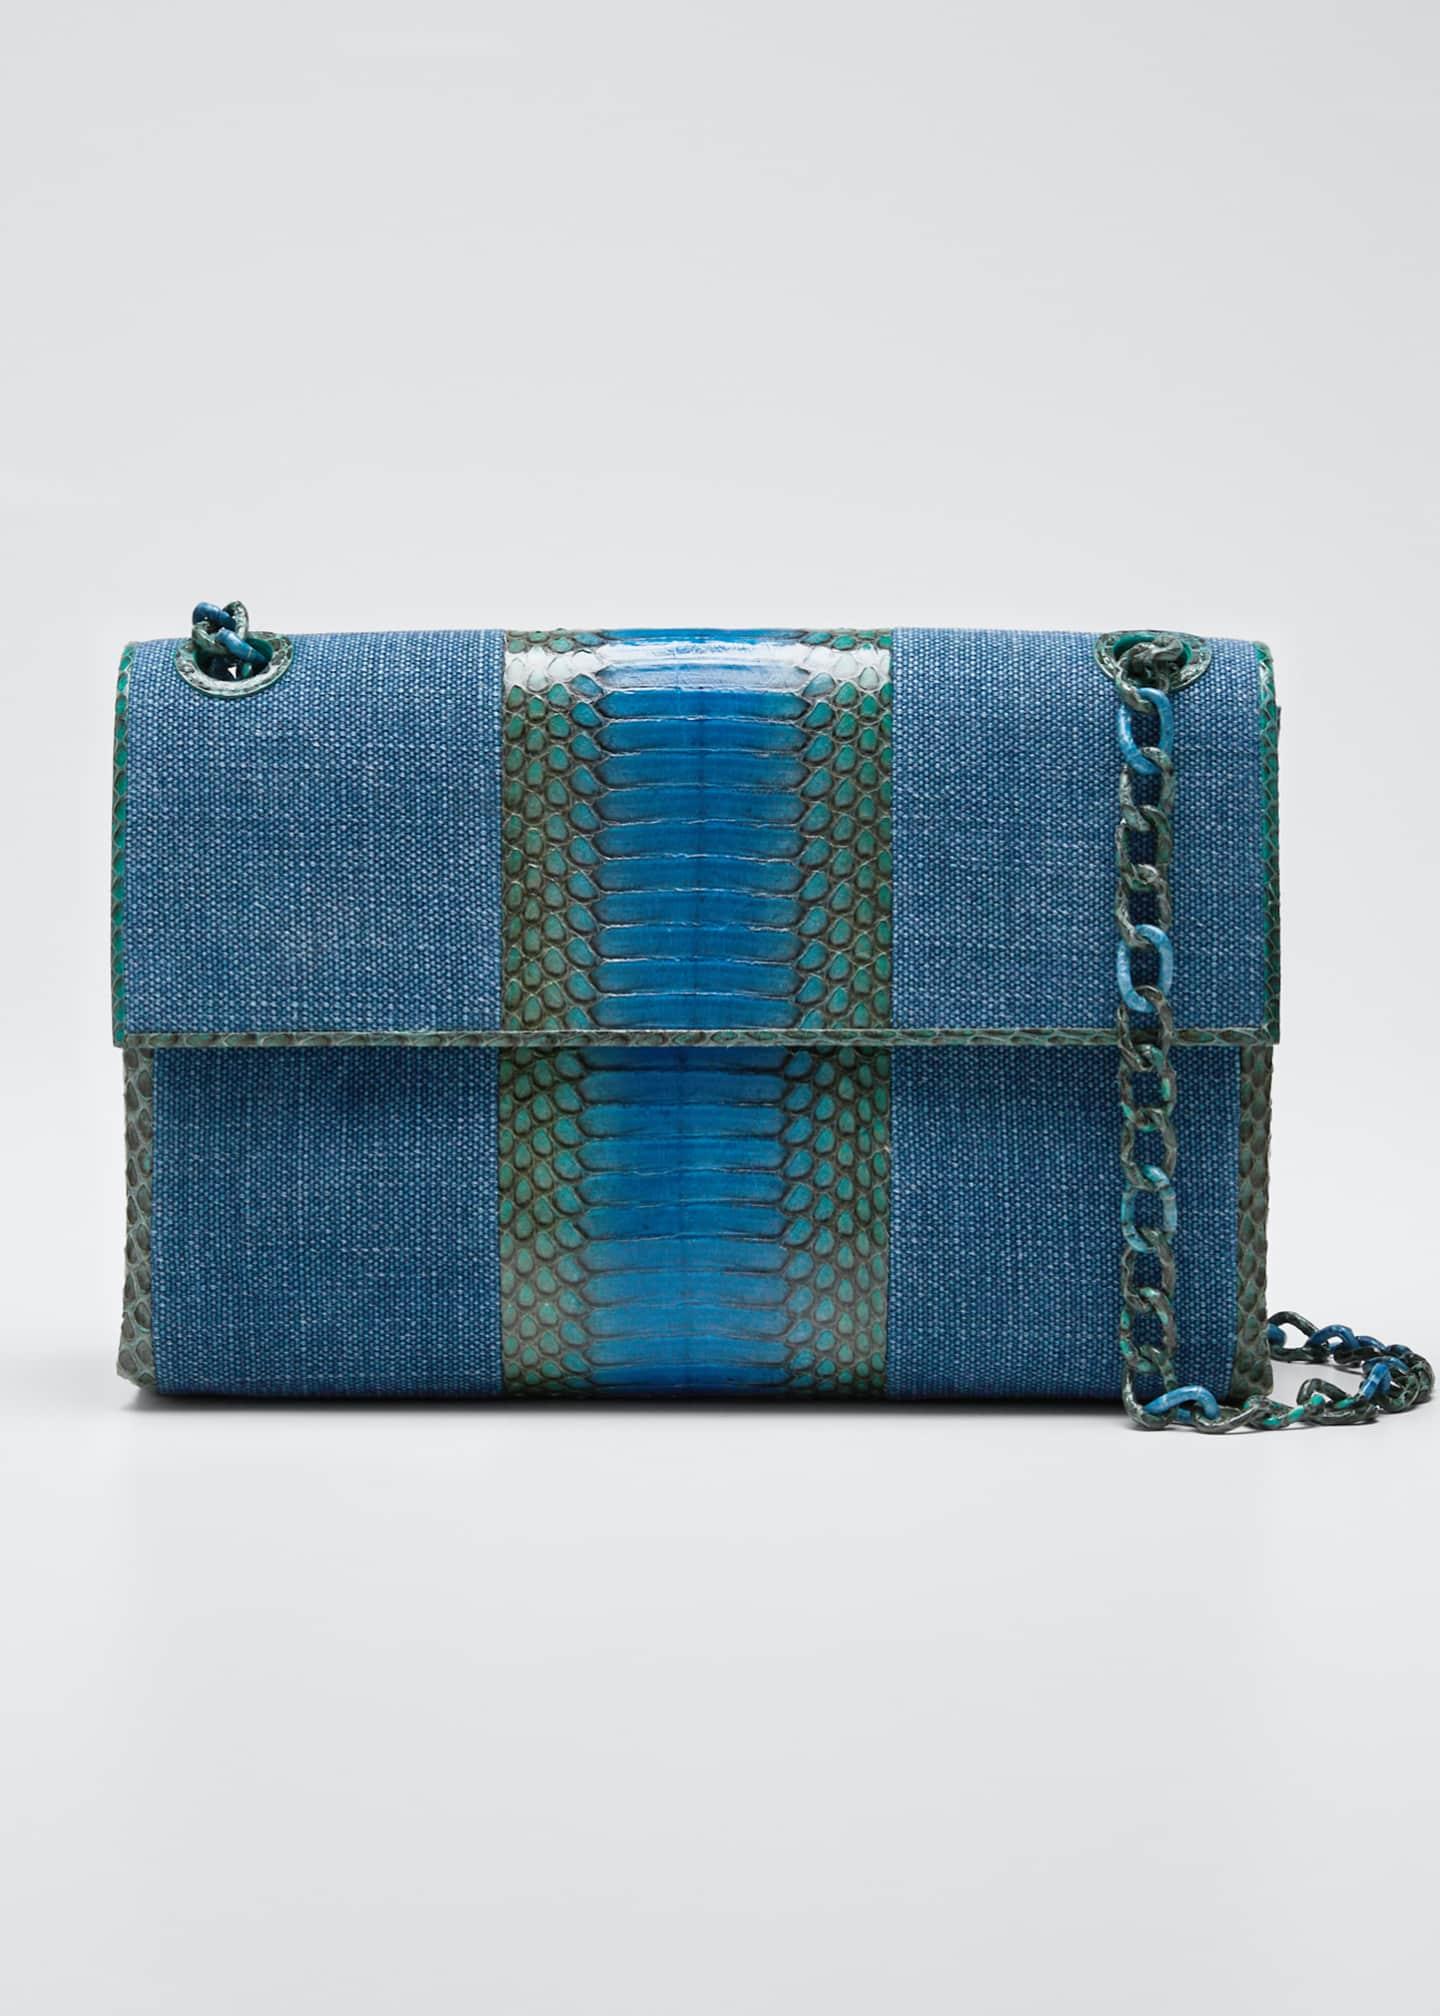 Nancy Gonzalez Madison Medium Linen/Snake Chain Shoulder Bag